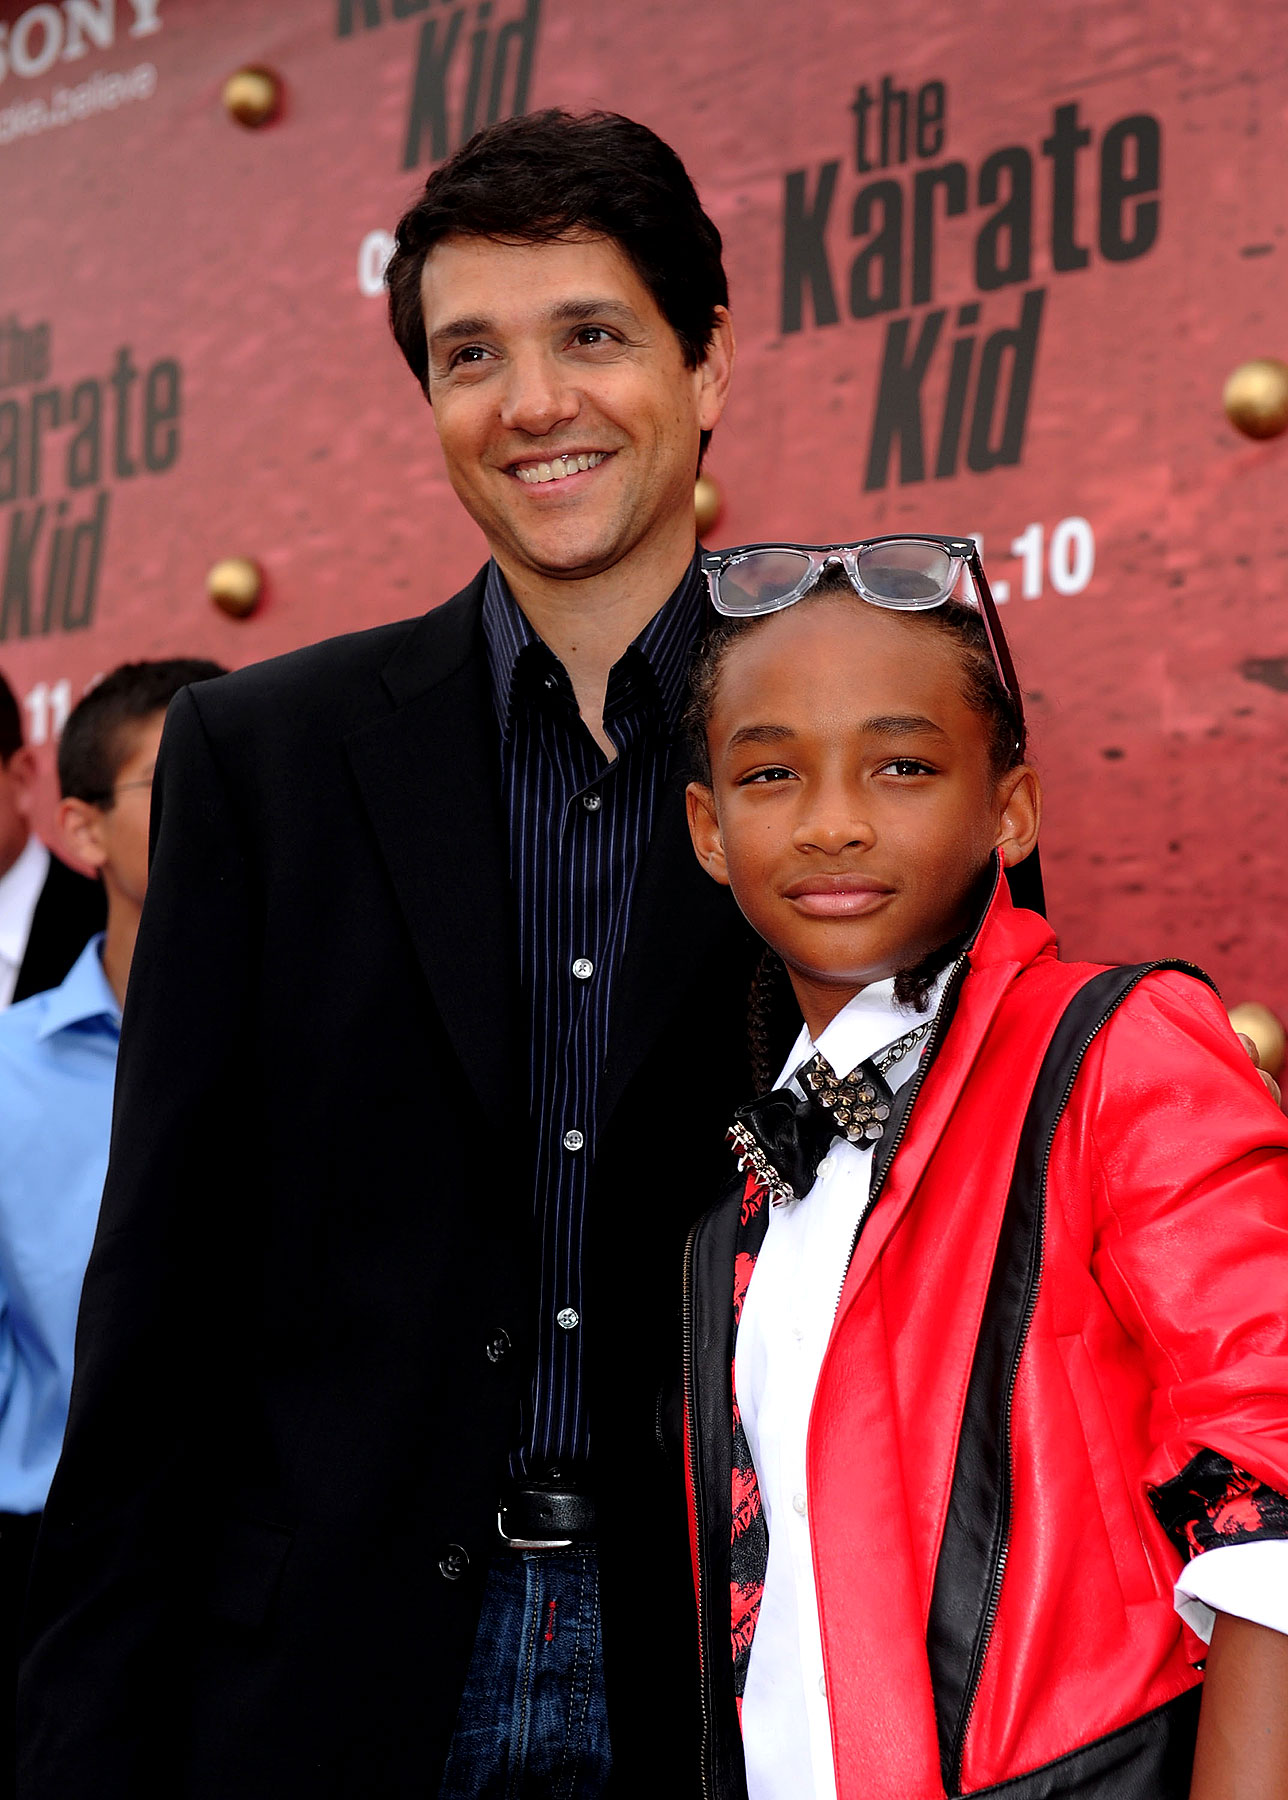 Fashion FAILs & FTWs Of 'The Karate Kid' Premiere (PHOTOS)